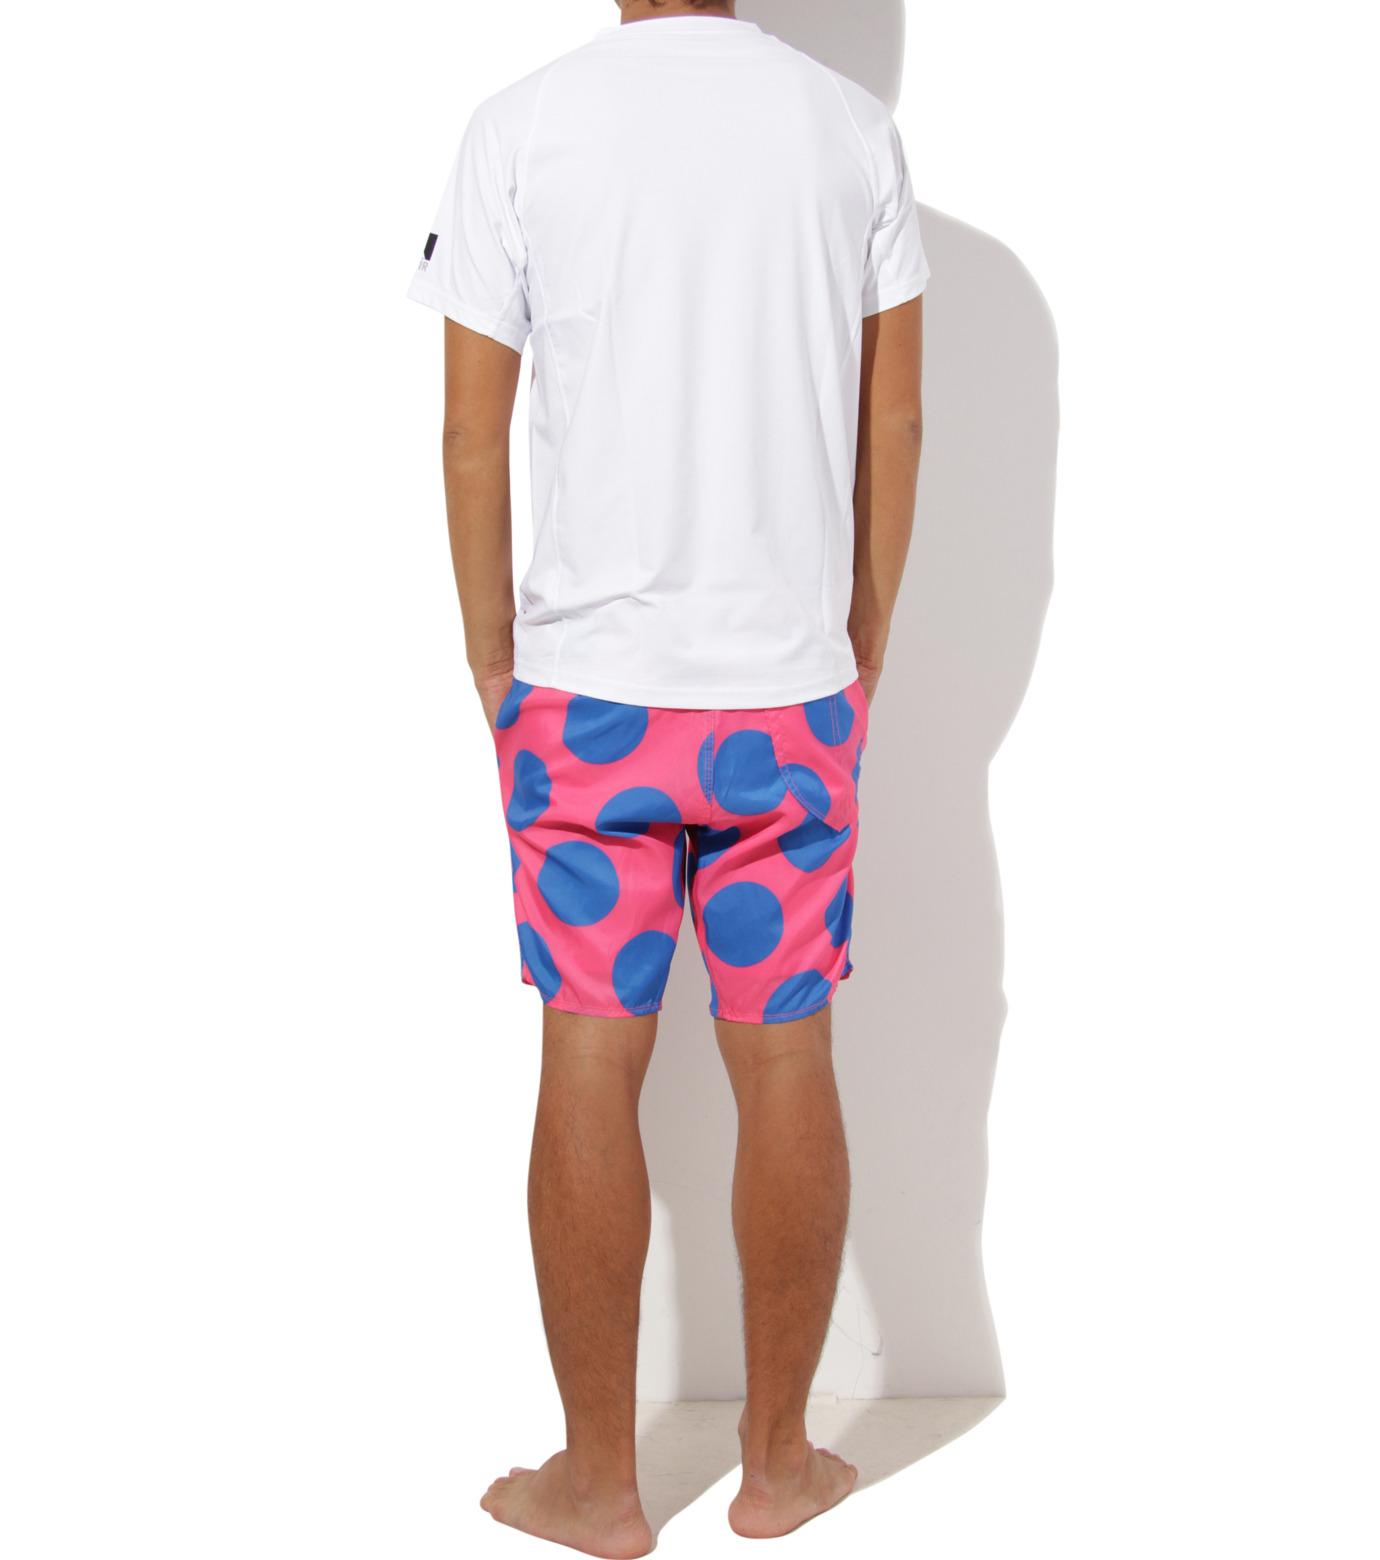 TWO TWO ONE(トゥートゥーワン)のDot surf shorts-SALMON PINK(SWIMWEAR/SWIMWEAR)-15N98003-73 拡大詳細画像6